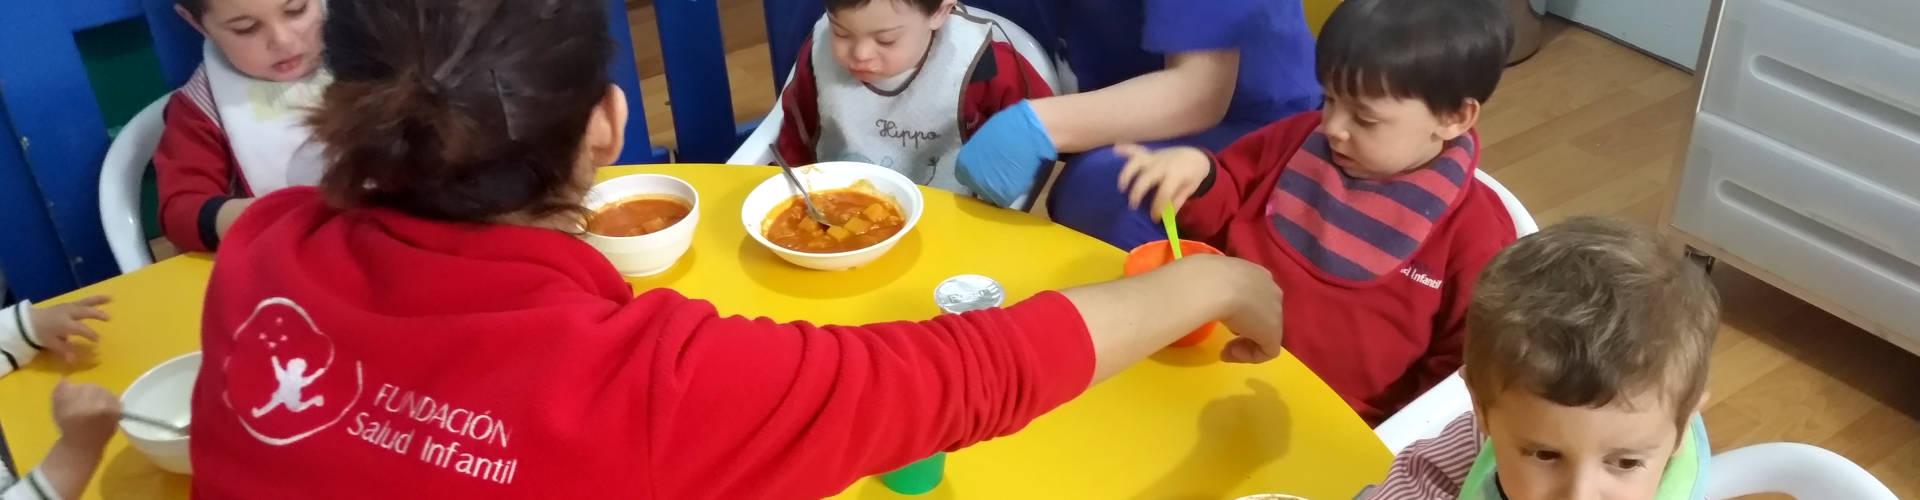 mesa_alimentacion-1